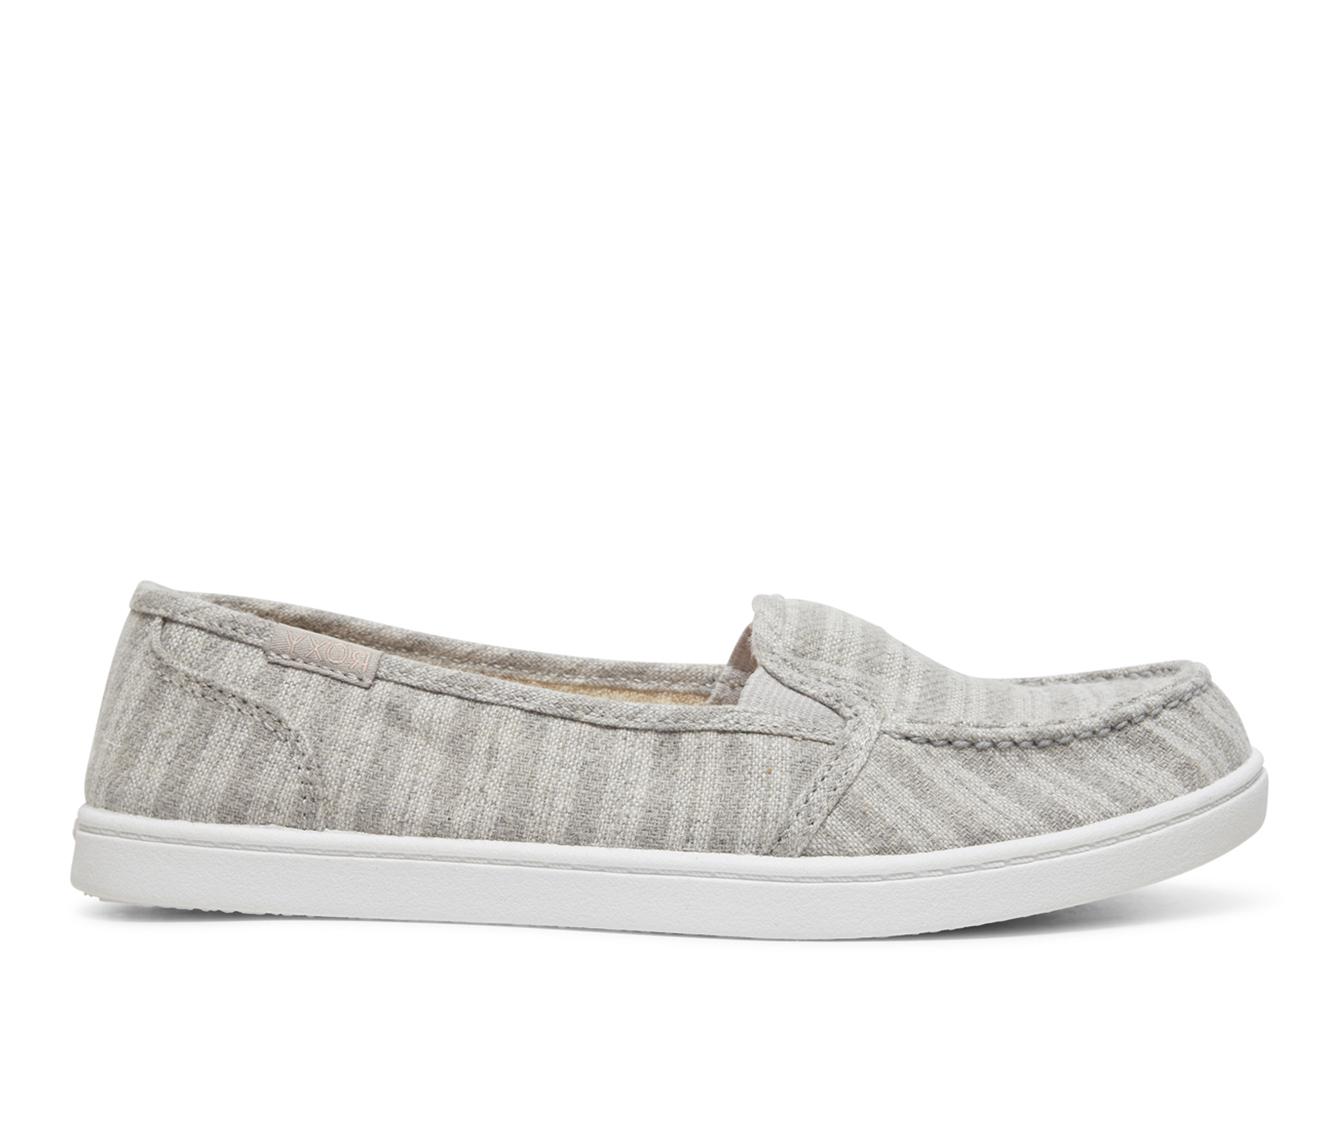 Roxy Minnow V Women's Shoe (Gray Canvas)